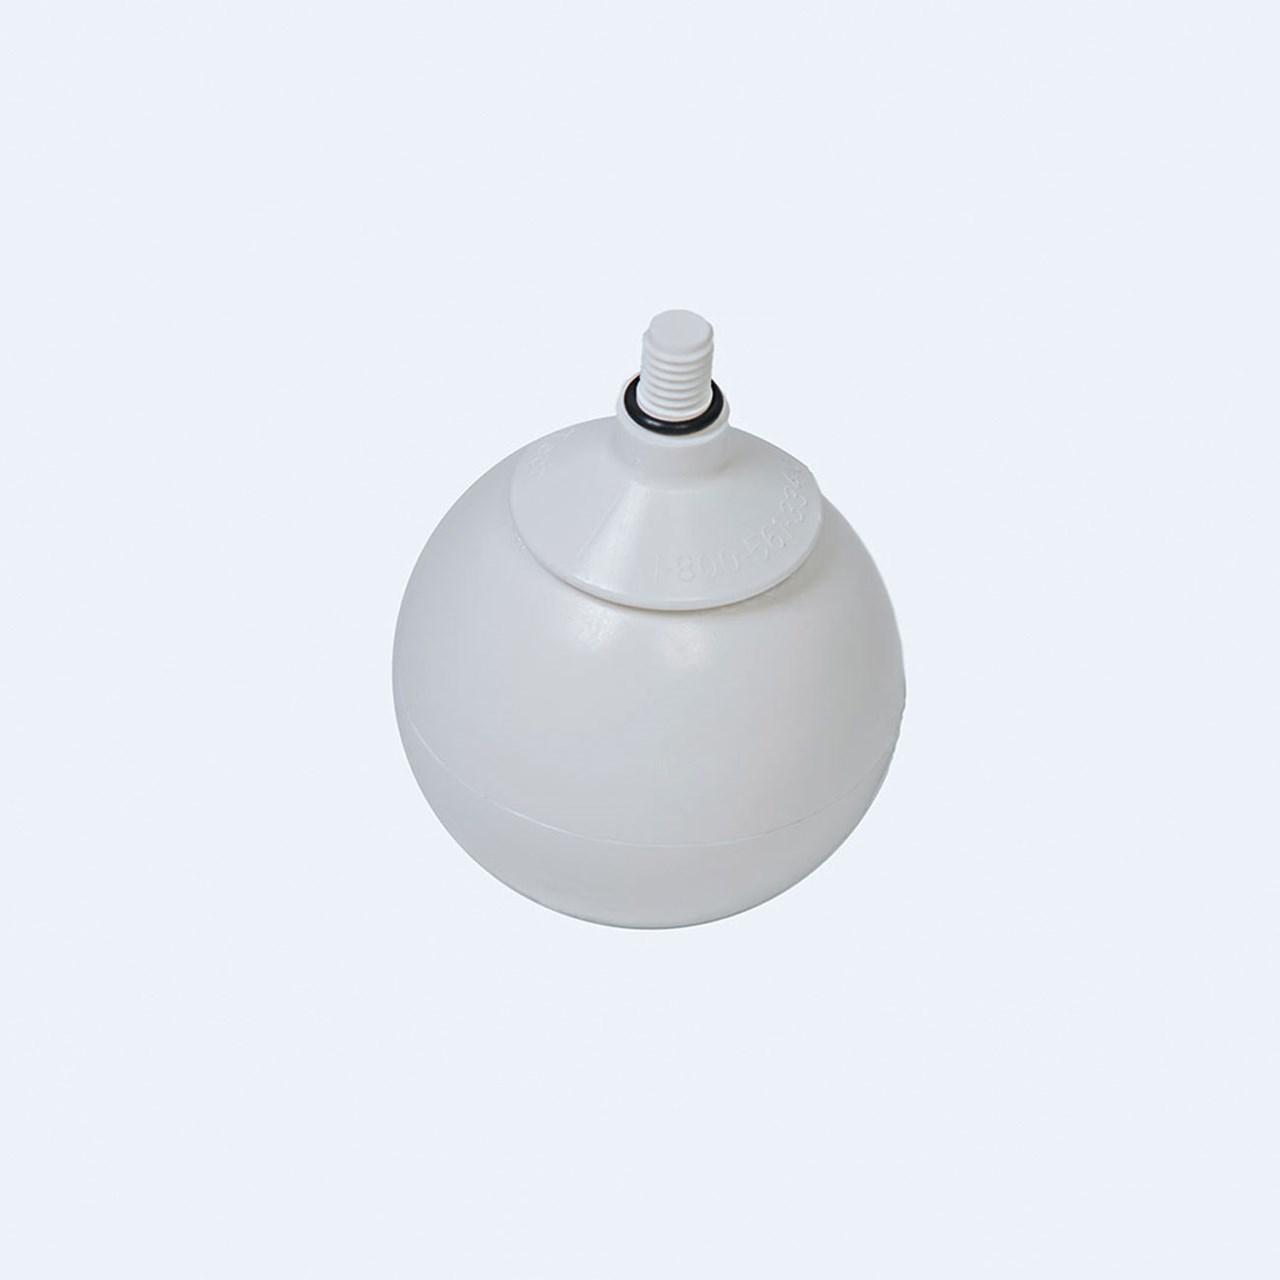 Ambutech 8mm Threaded Rolling Ball Tip - White